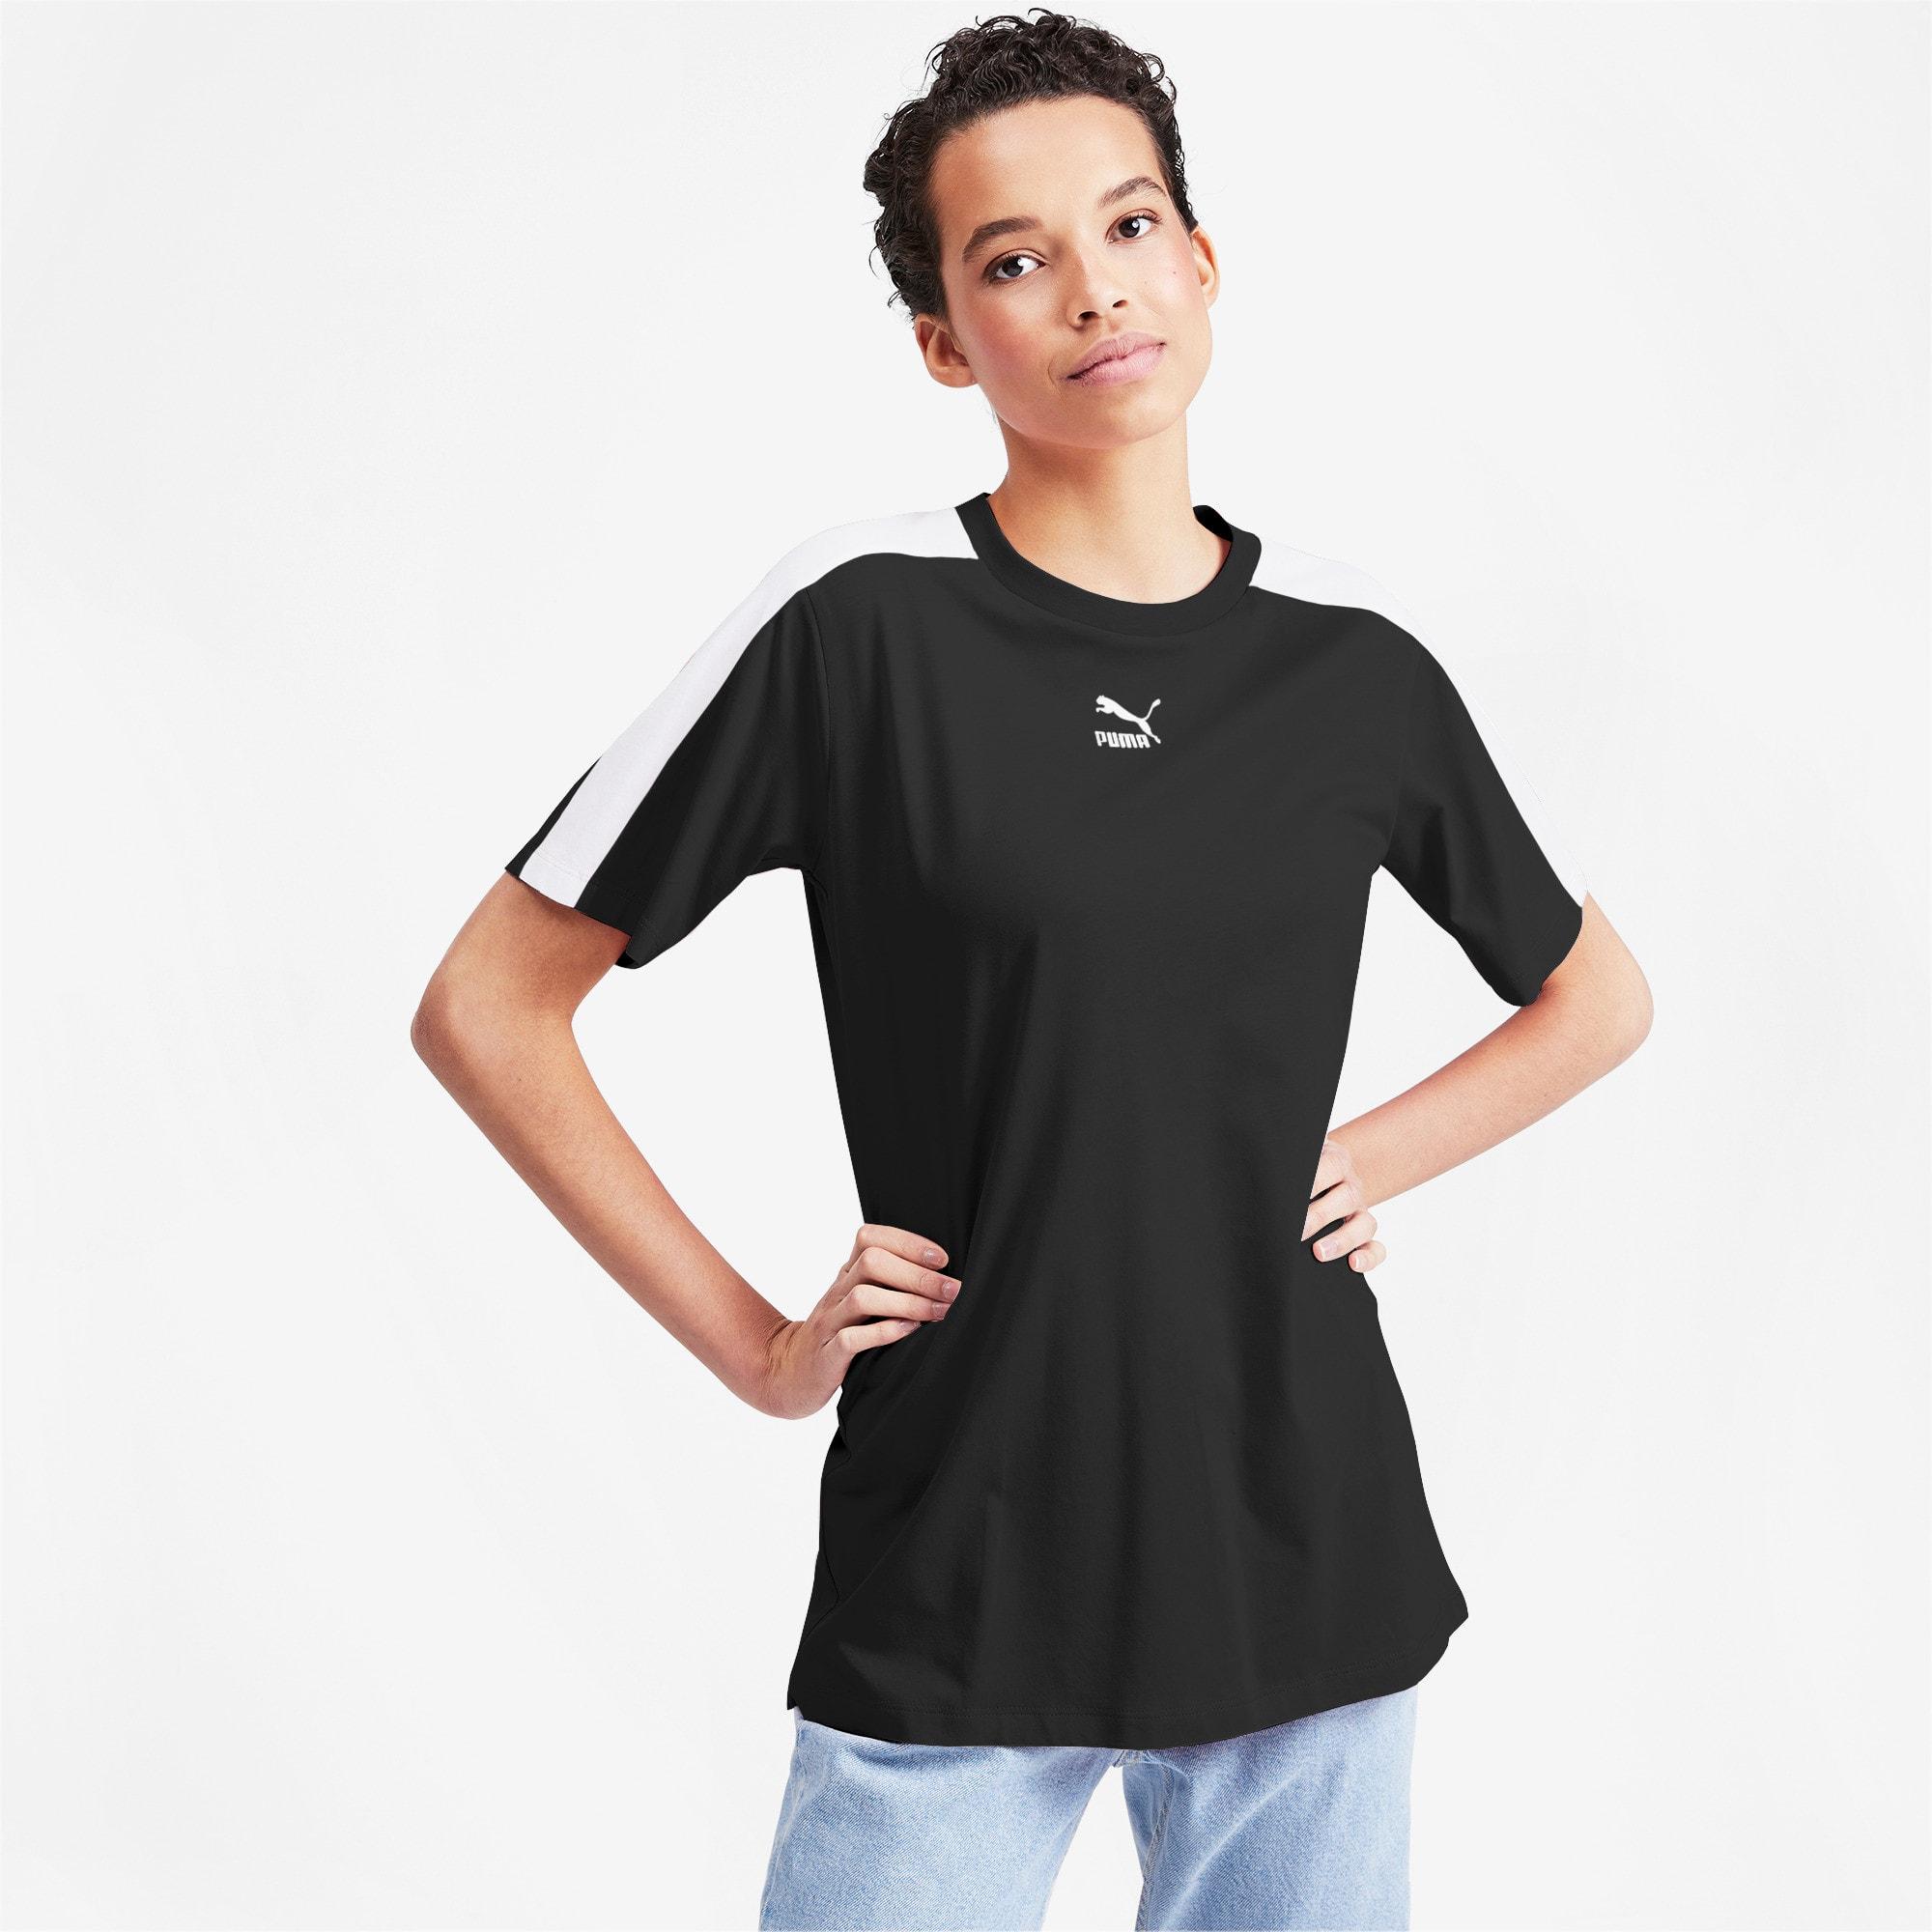 Miniatura 1 de Camiseta Classics T7 para mujer, Puma Black, mediano